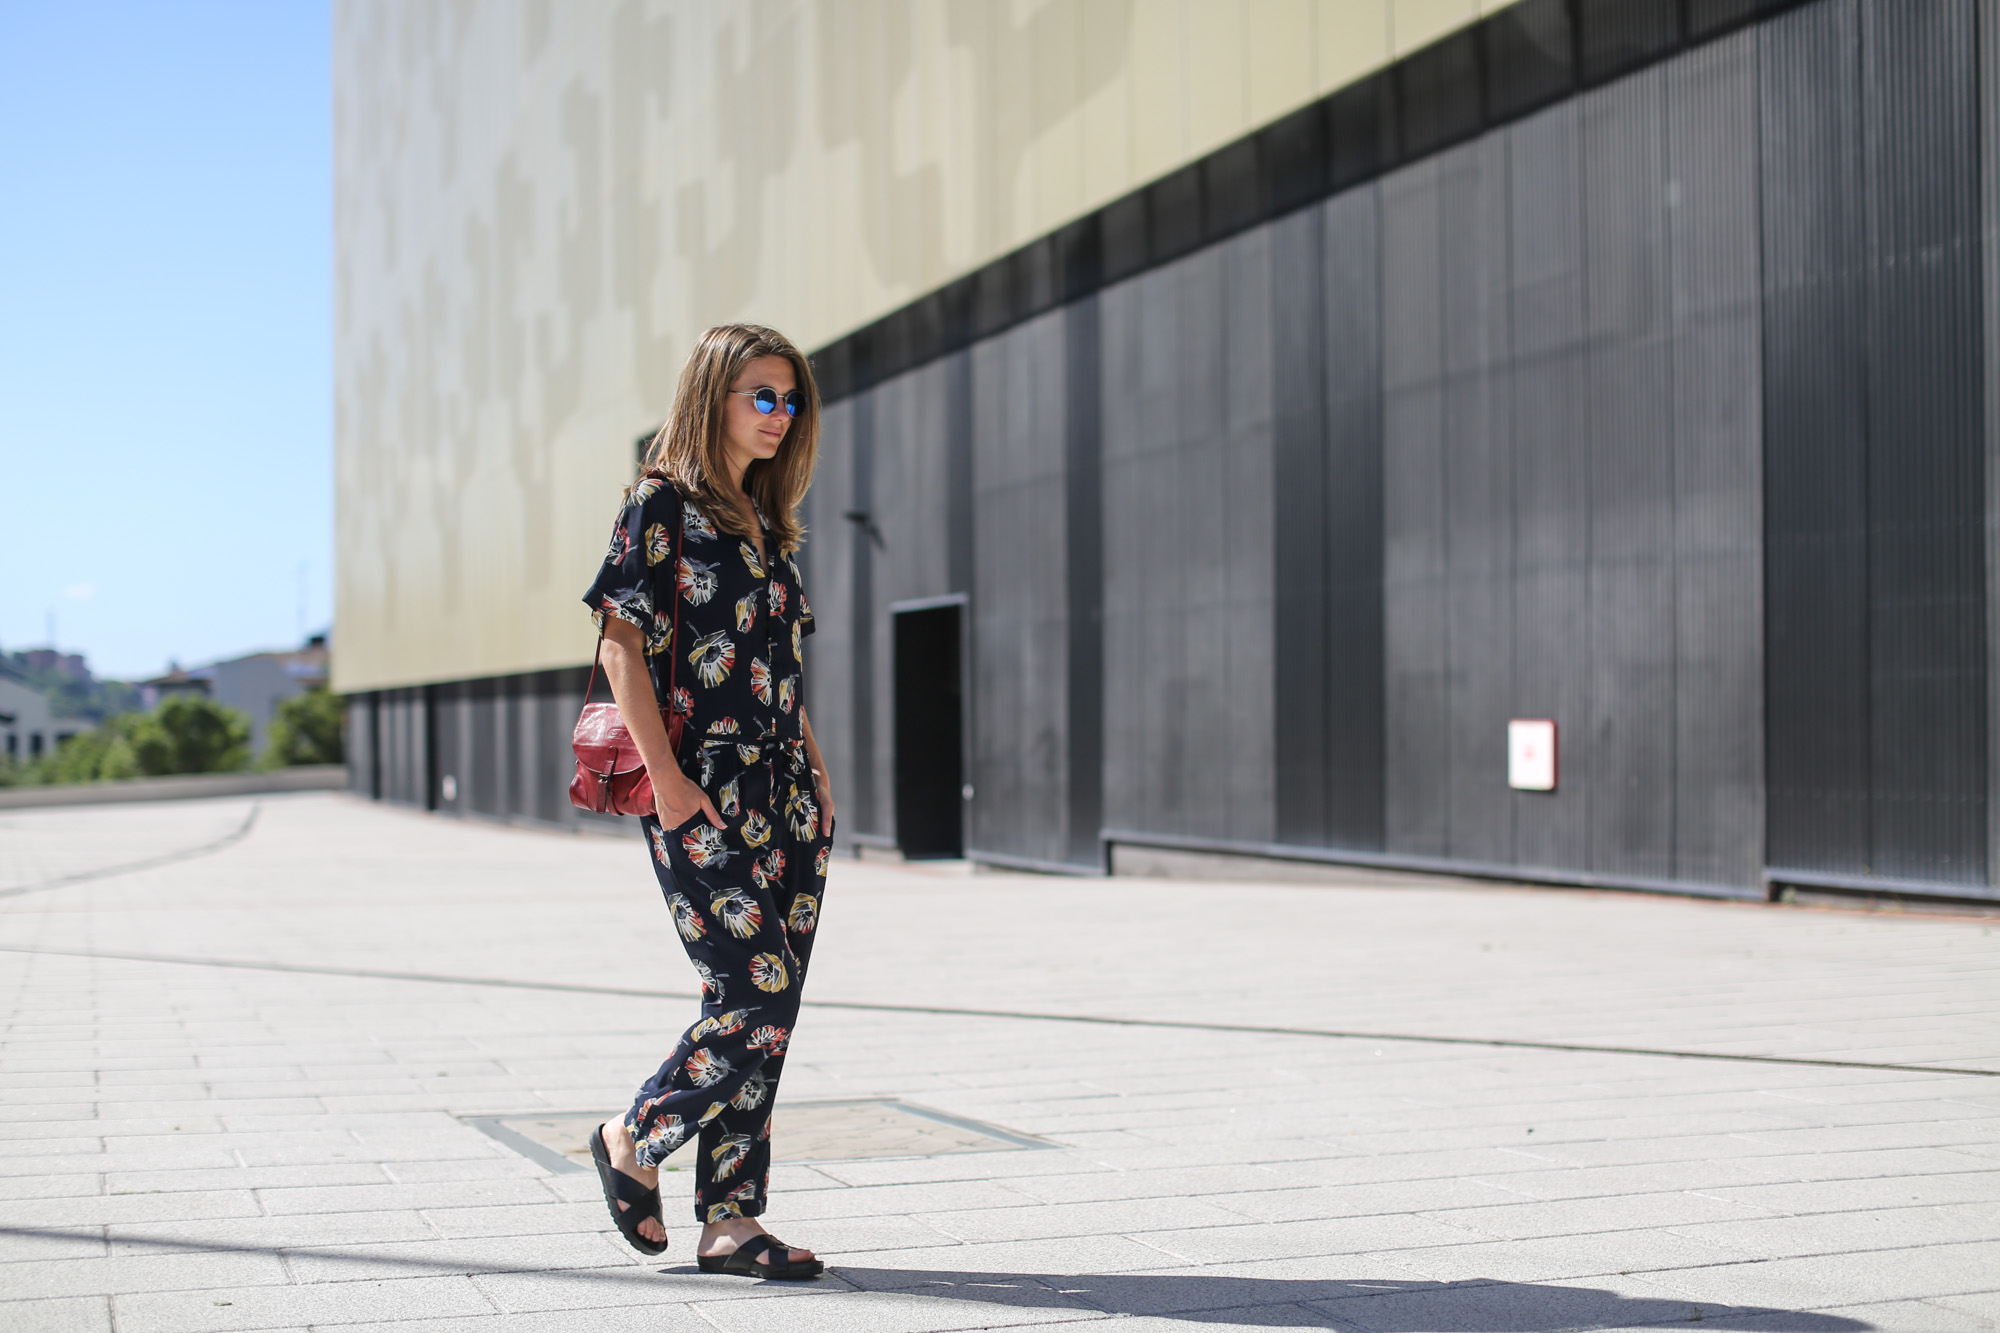 Clochet-streetstyle-vagabond-sliders-zara-flowers-jumpsuit-7